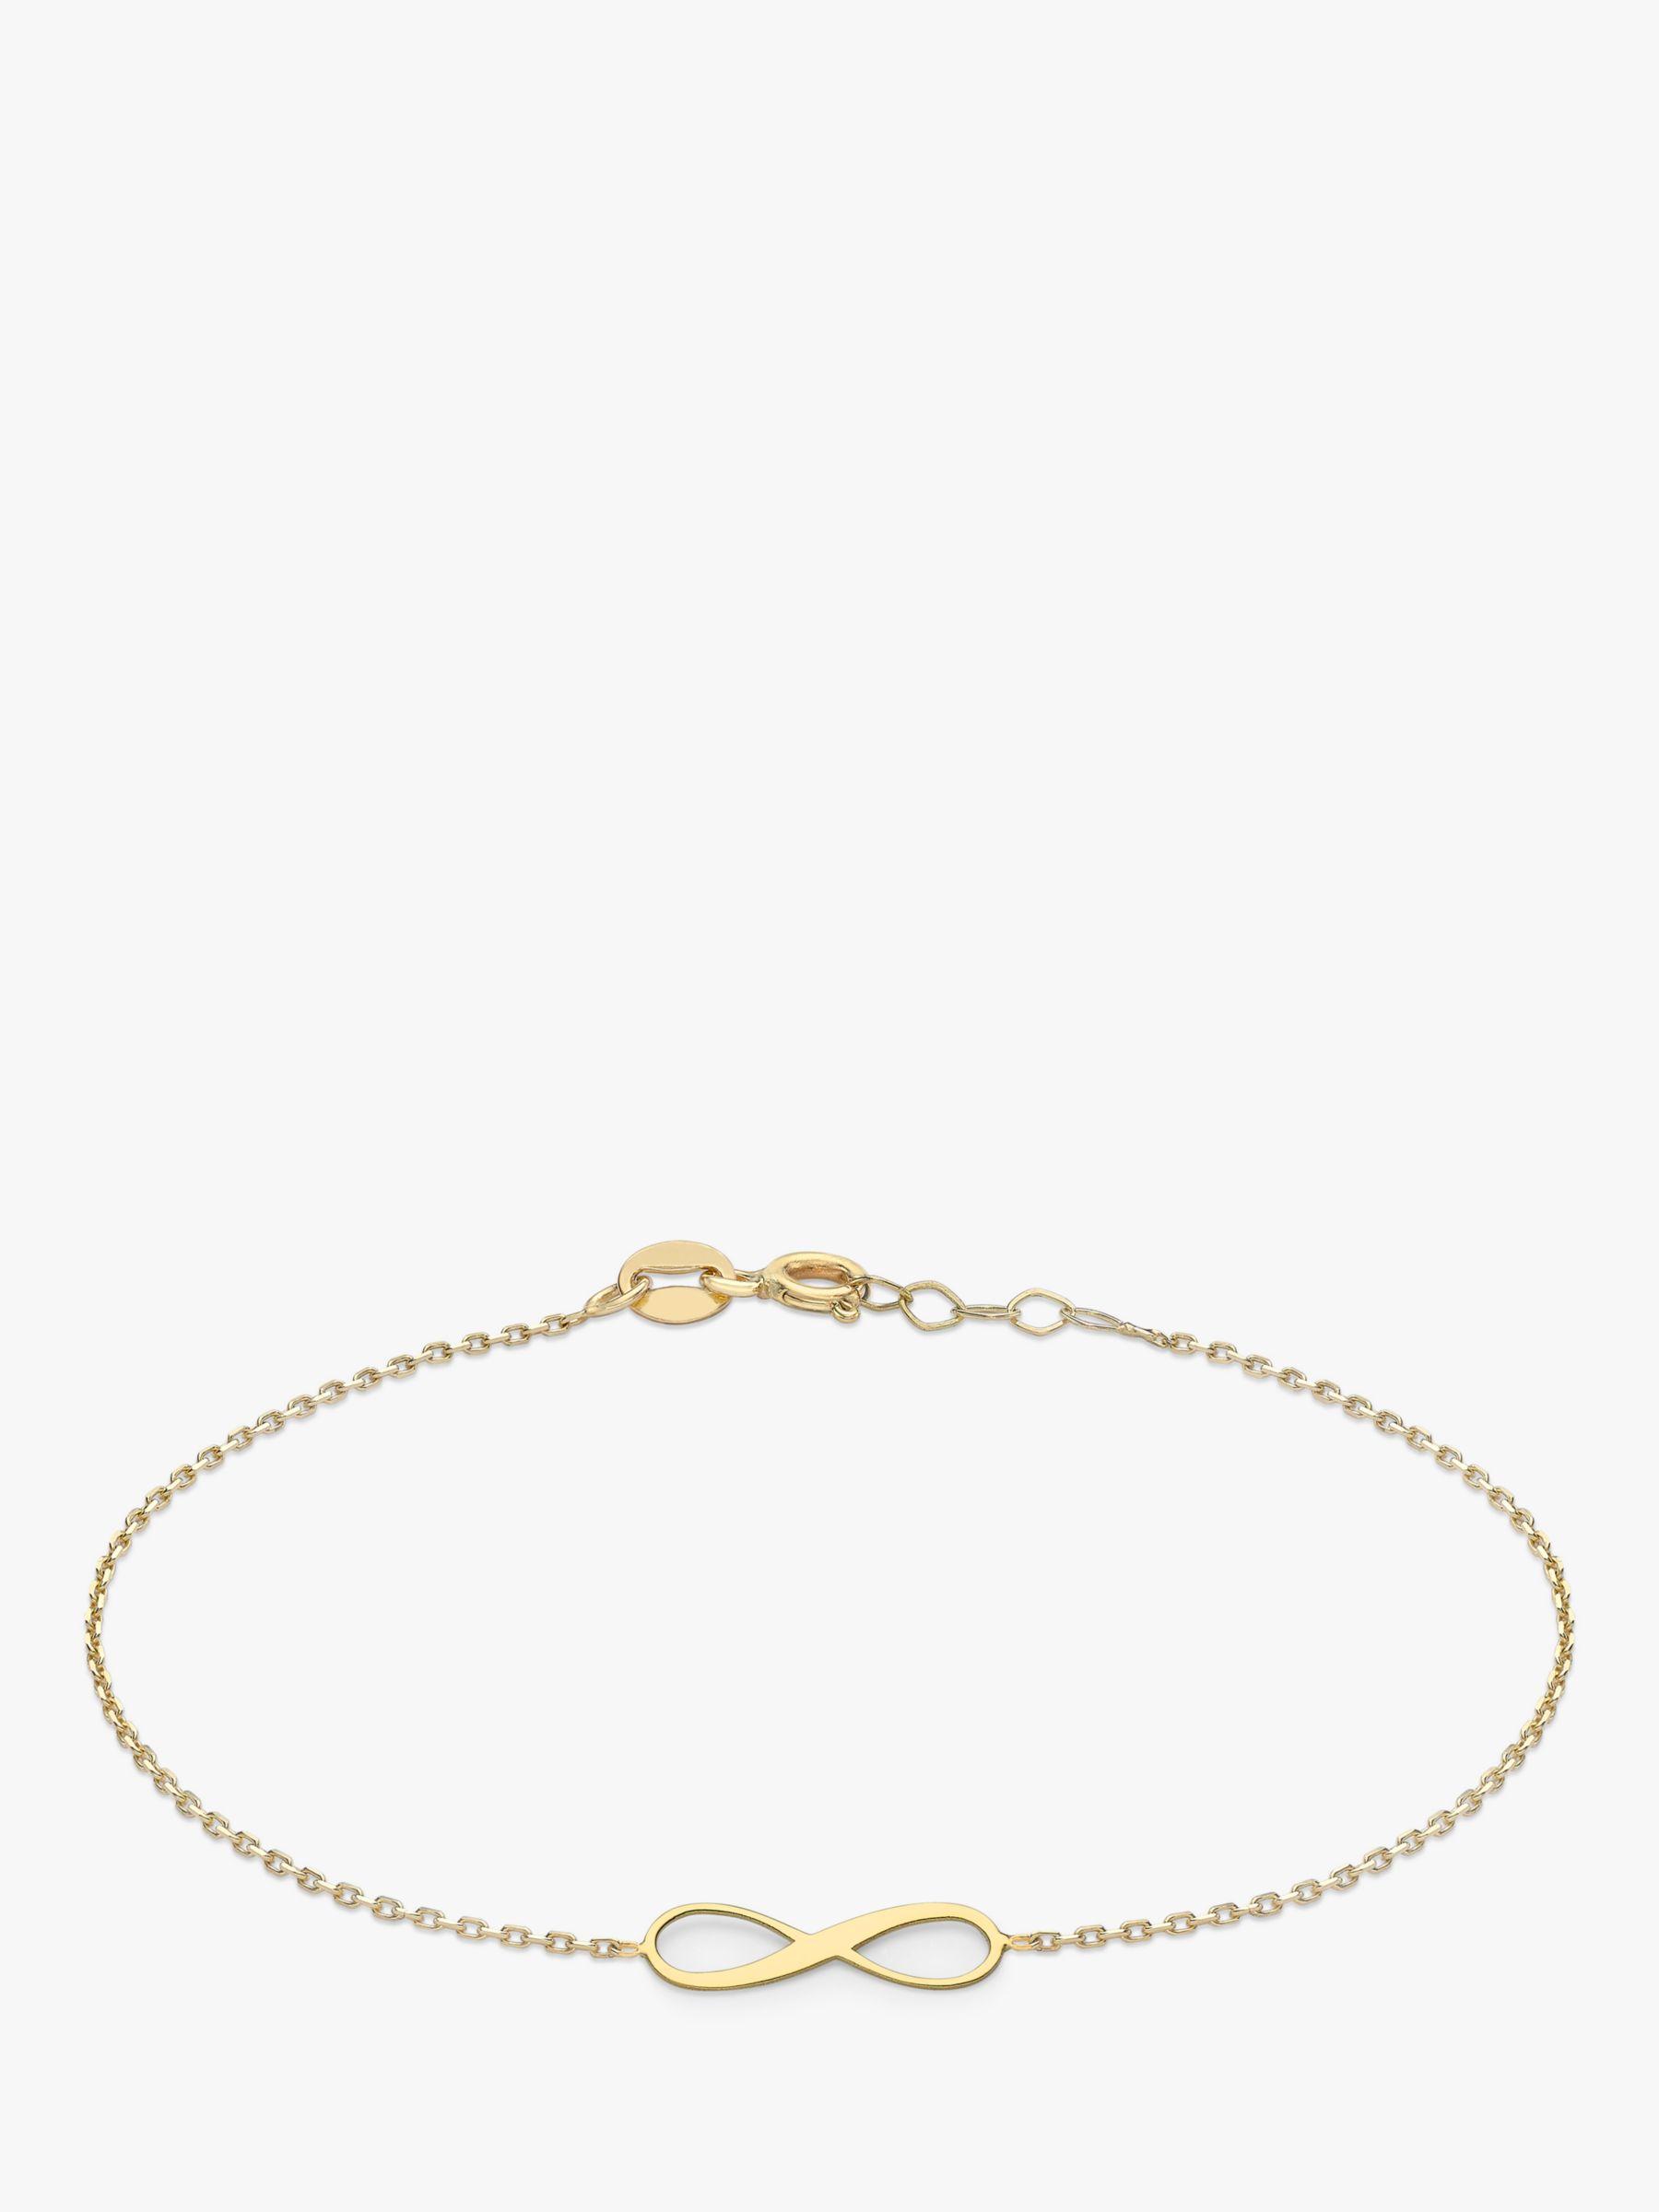 IBB IBB 9ct Gold Infinity Chain Bracelet, Gold